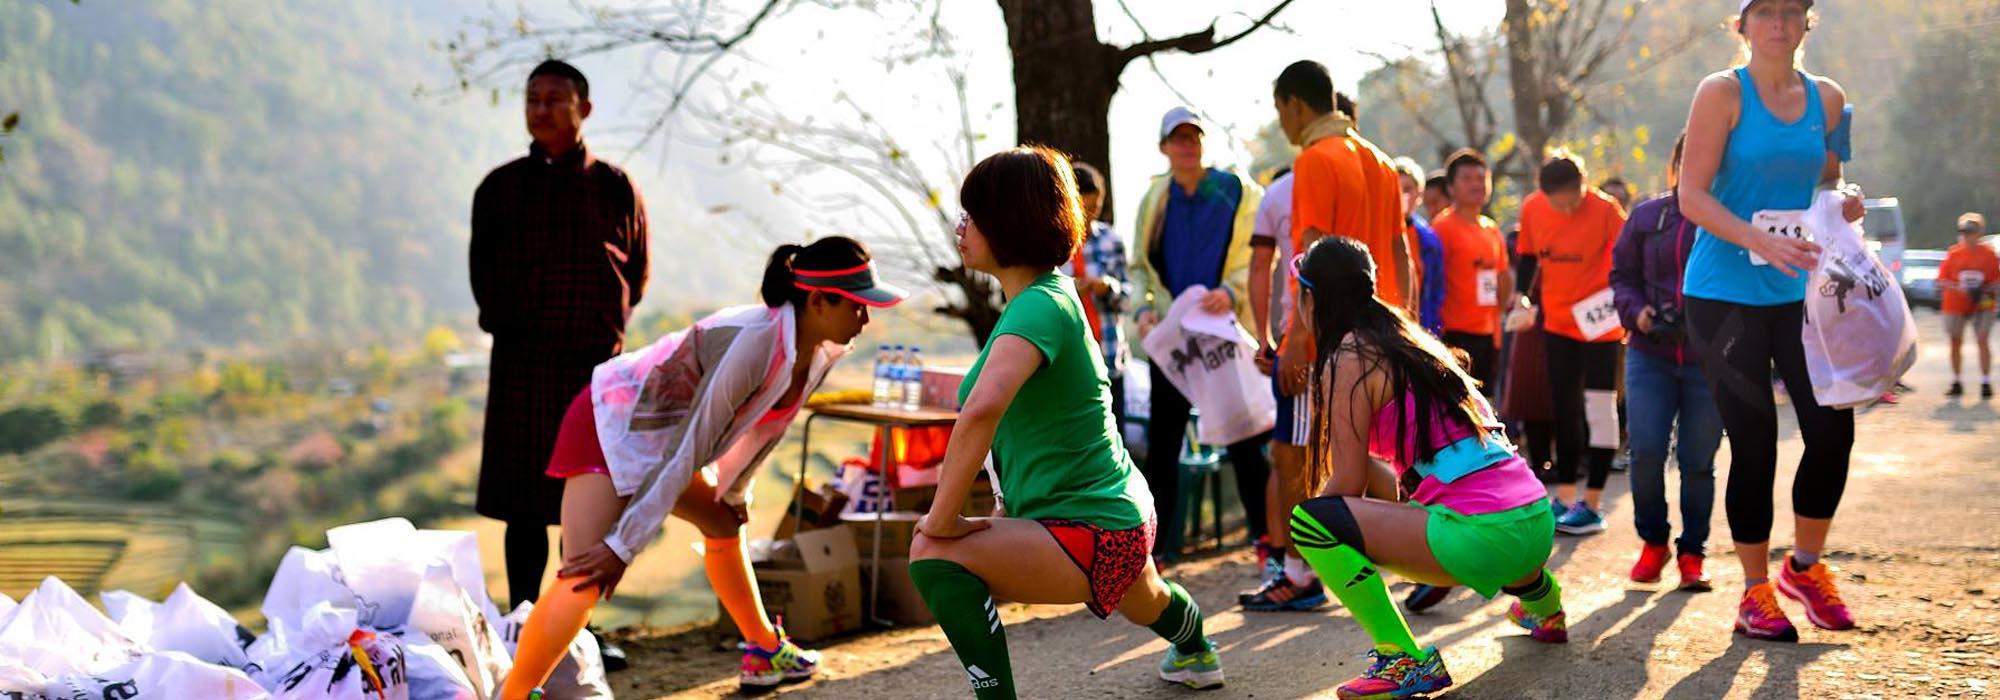 Bhutan International Half Marathon 2018